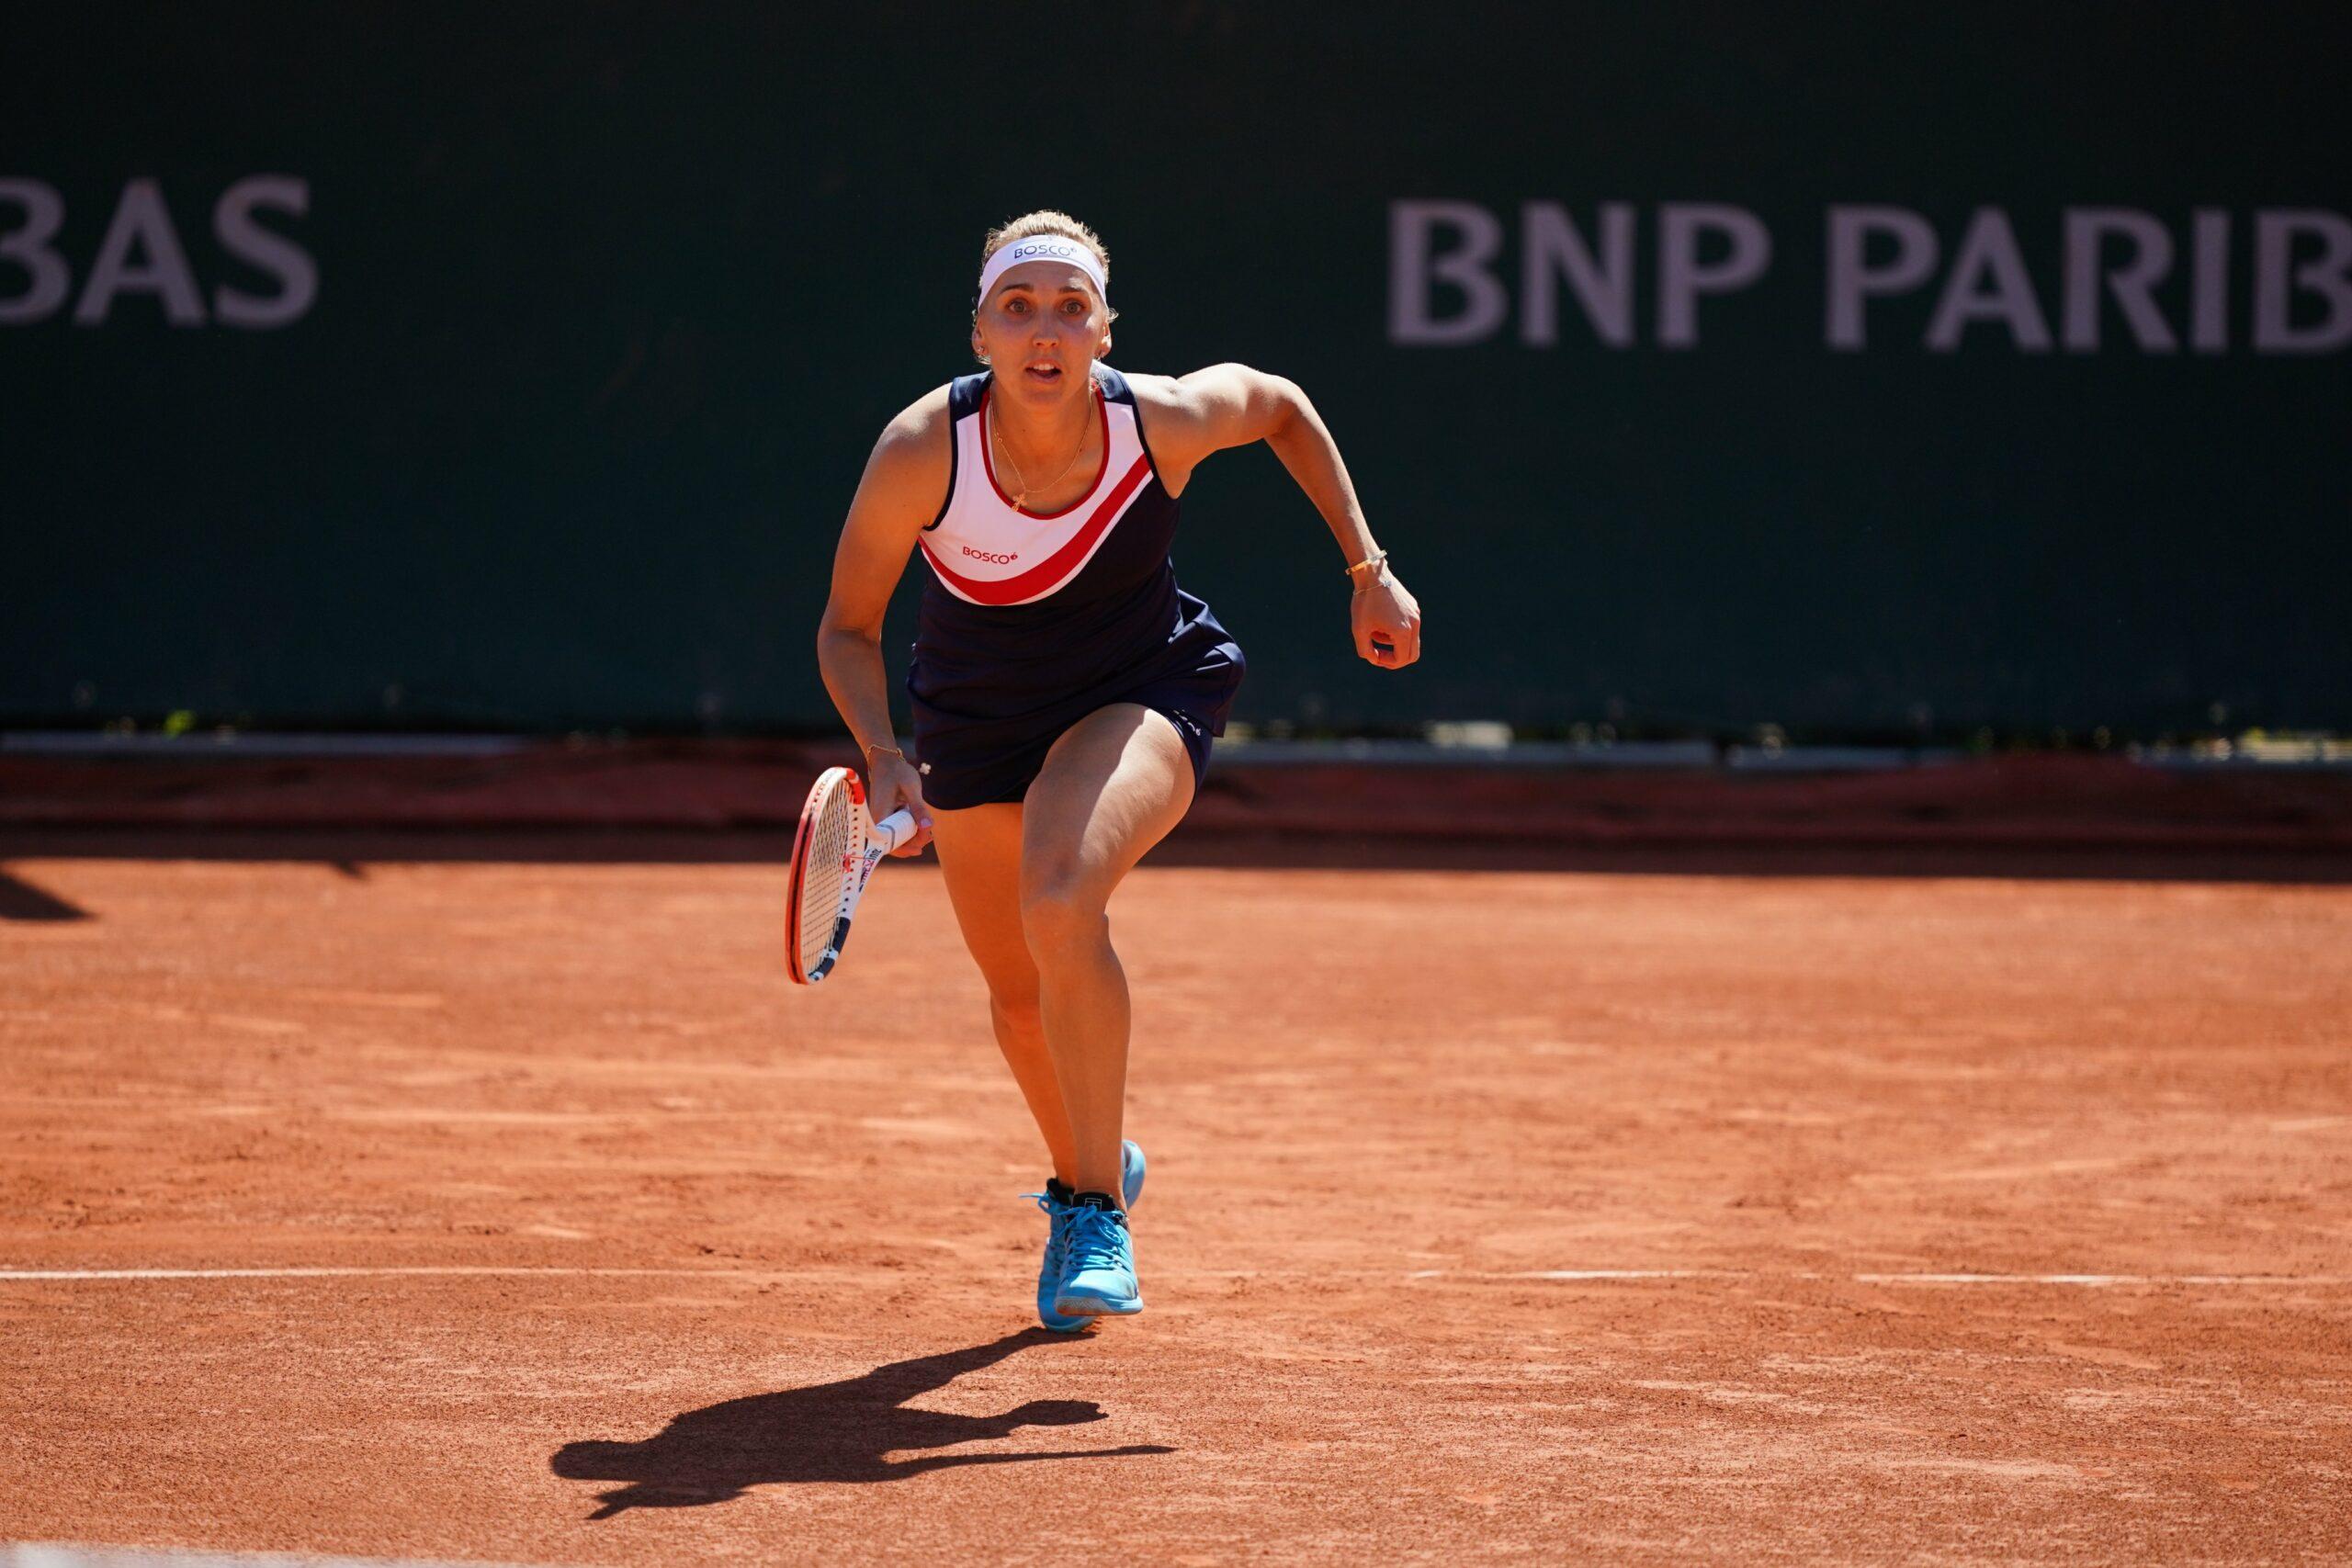 Vesnina - WTA - Roland Garros